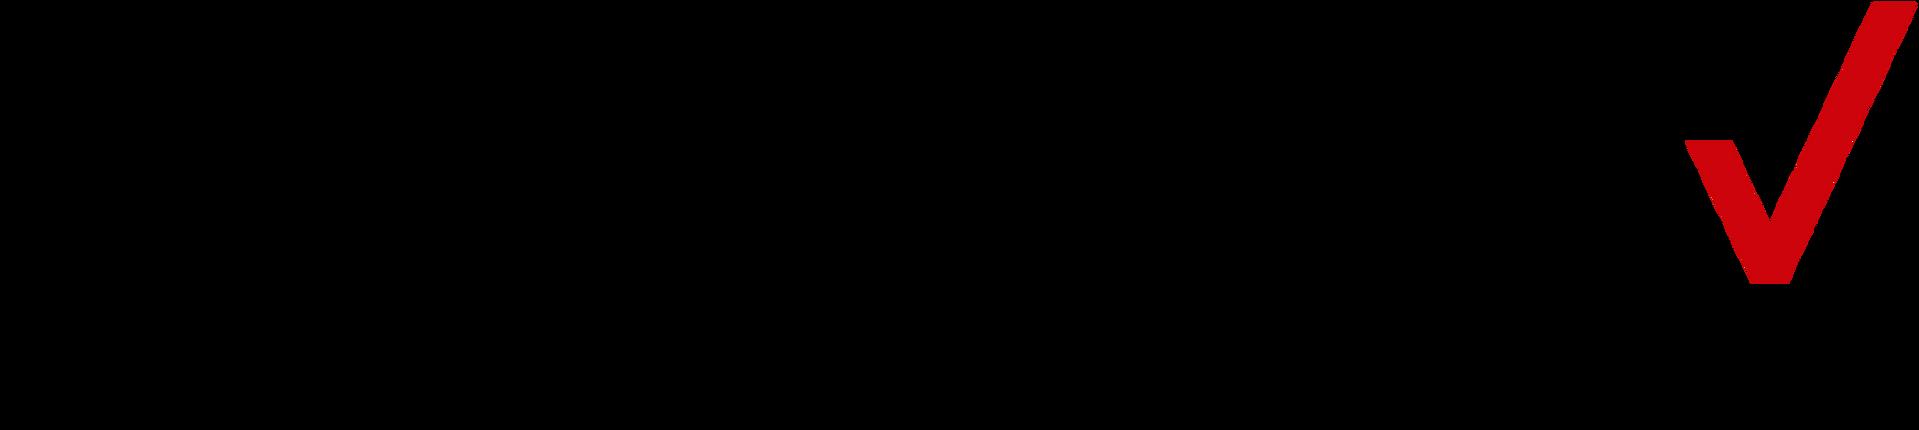 2000px-Verizon_2015_logo_-vector.svg.png